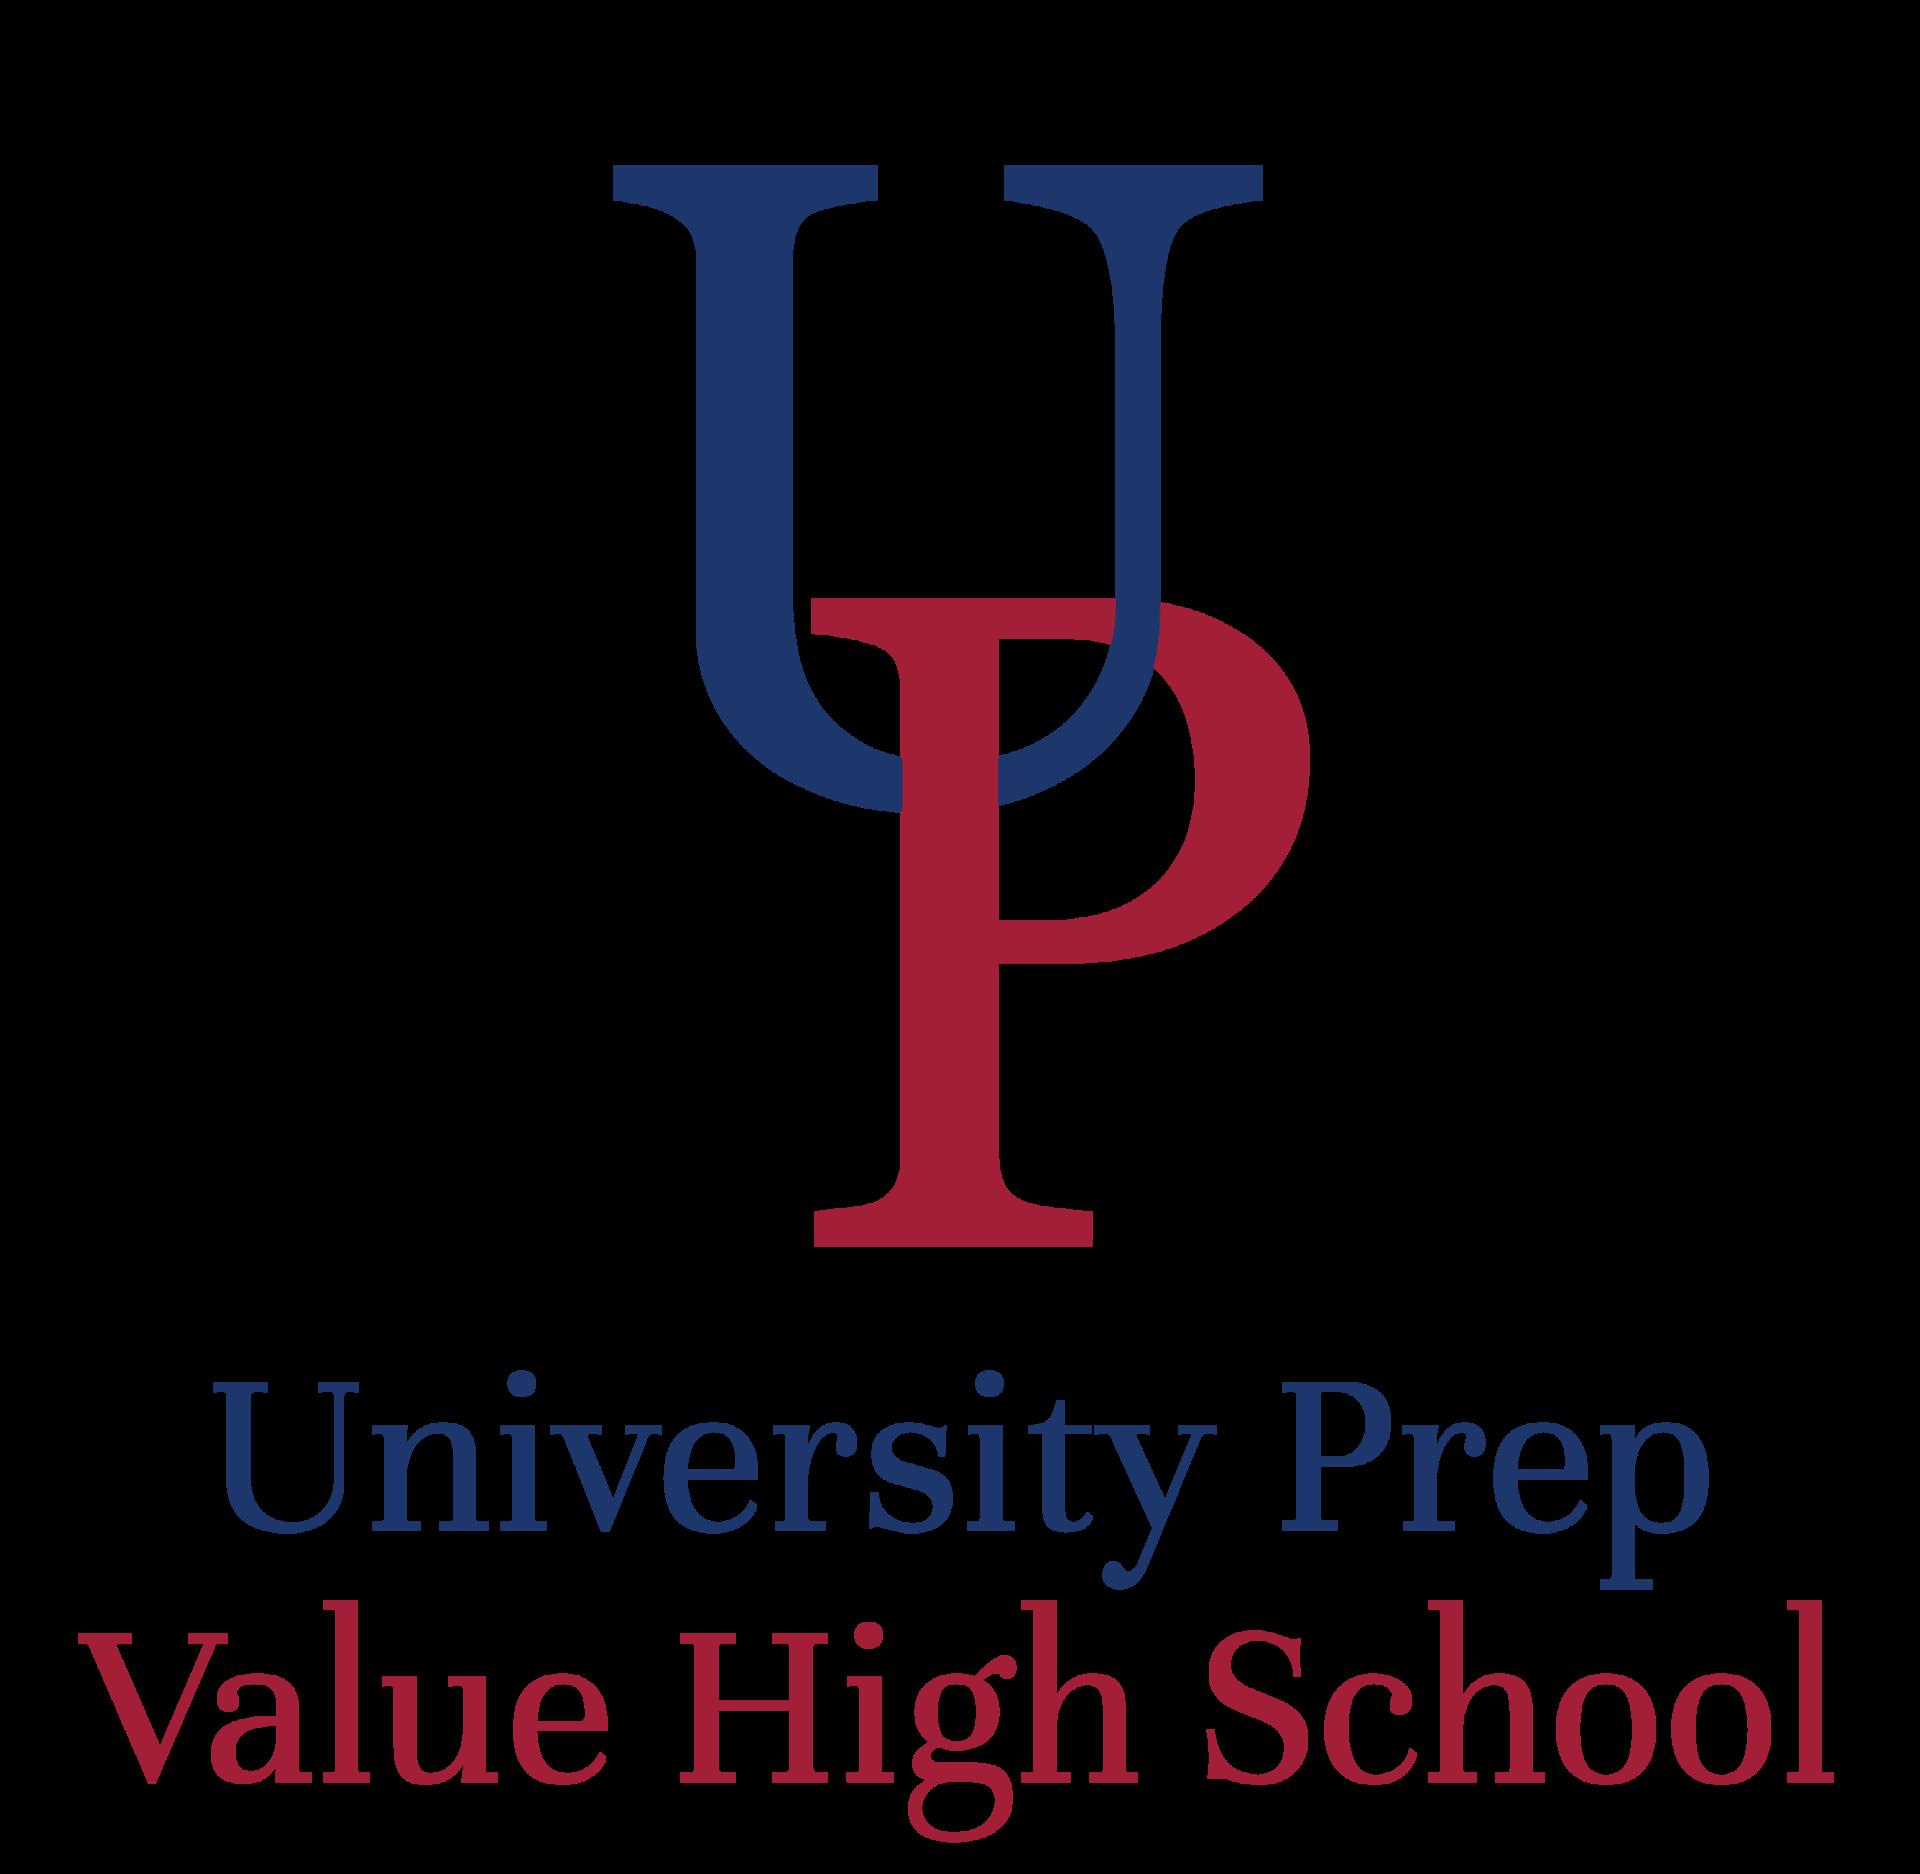 Apply to University Prep Value High School